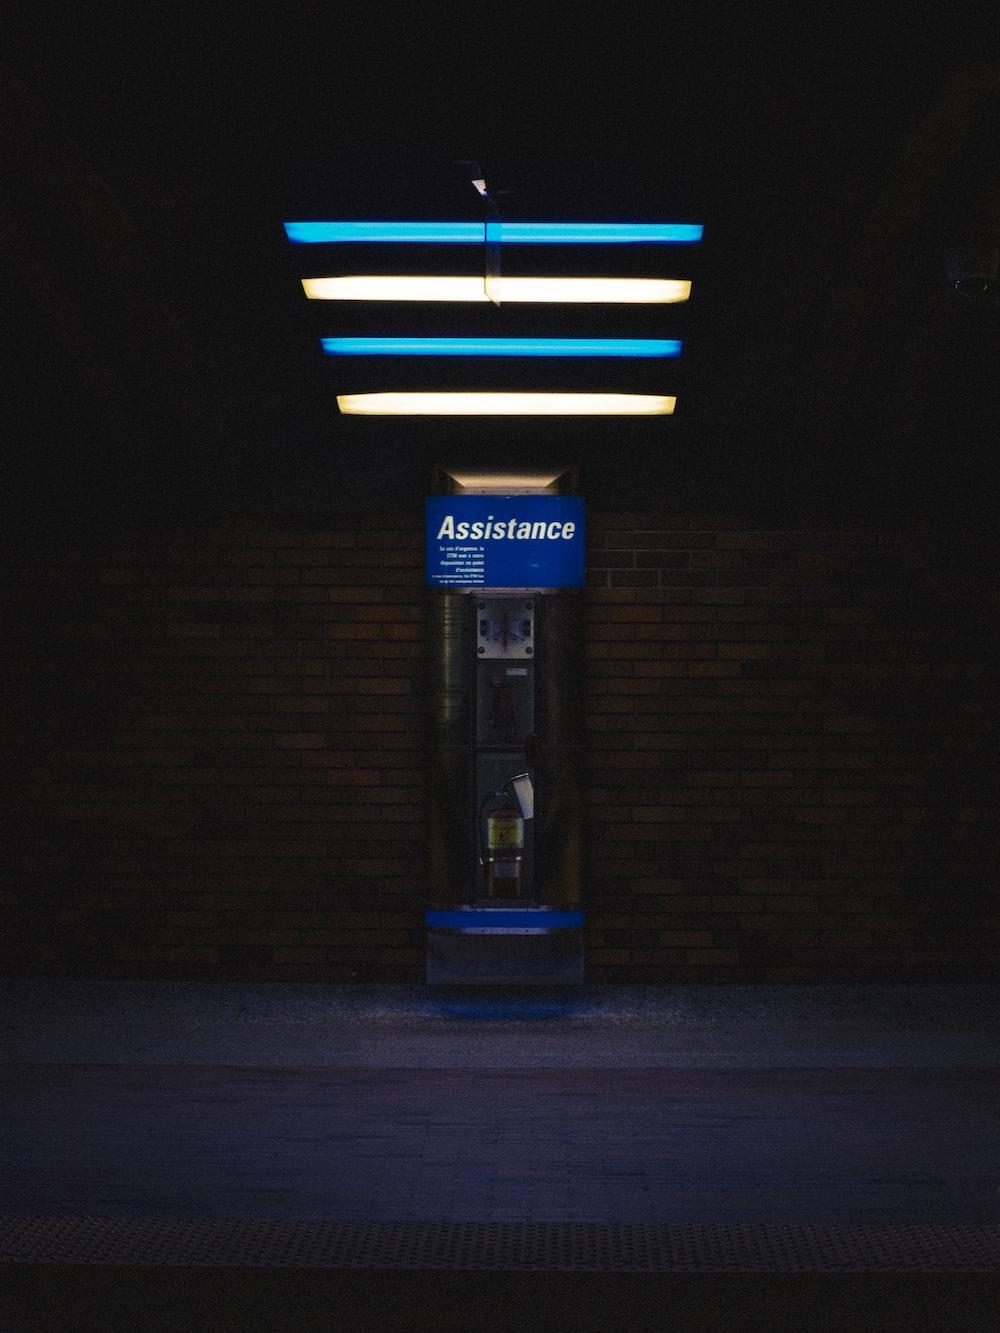 lighted Assistance signage